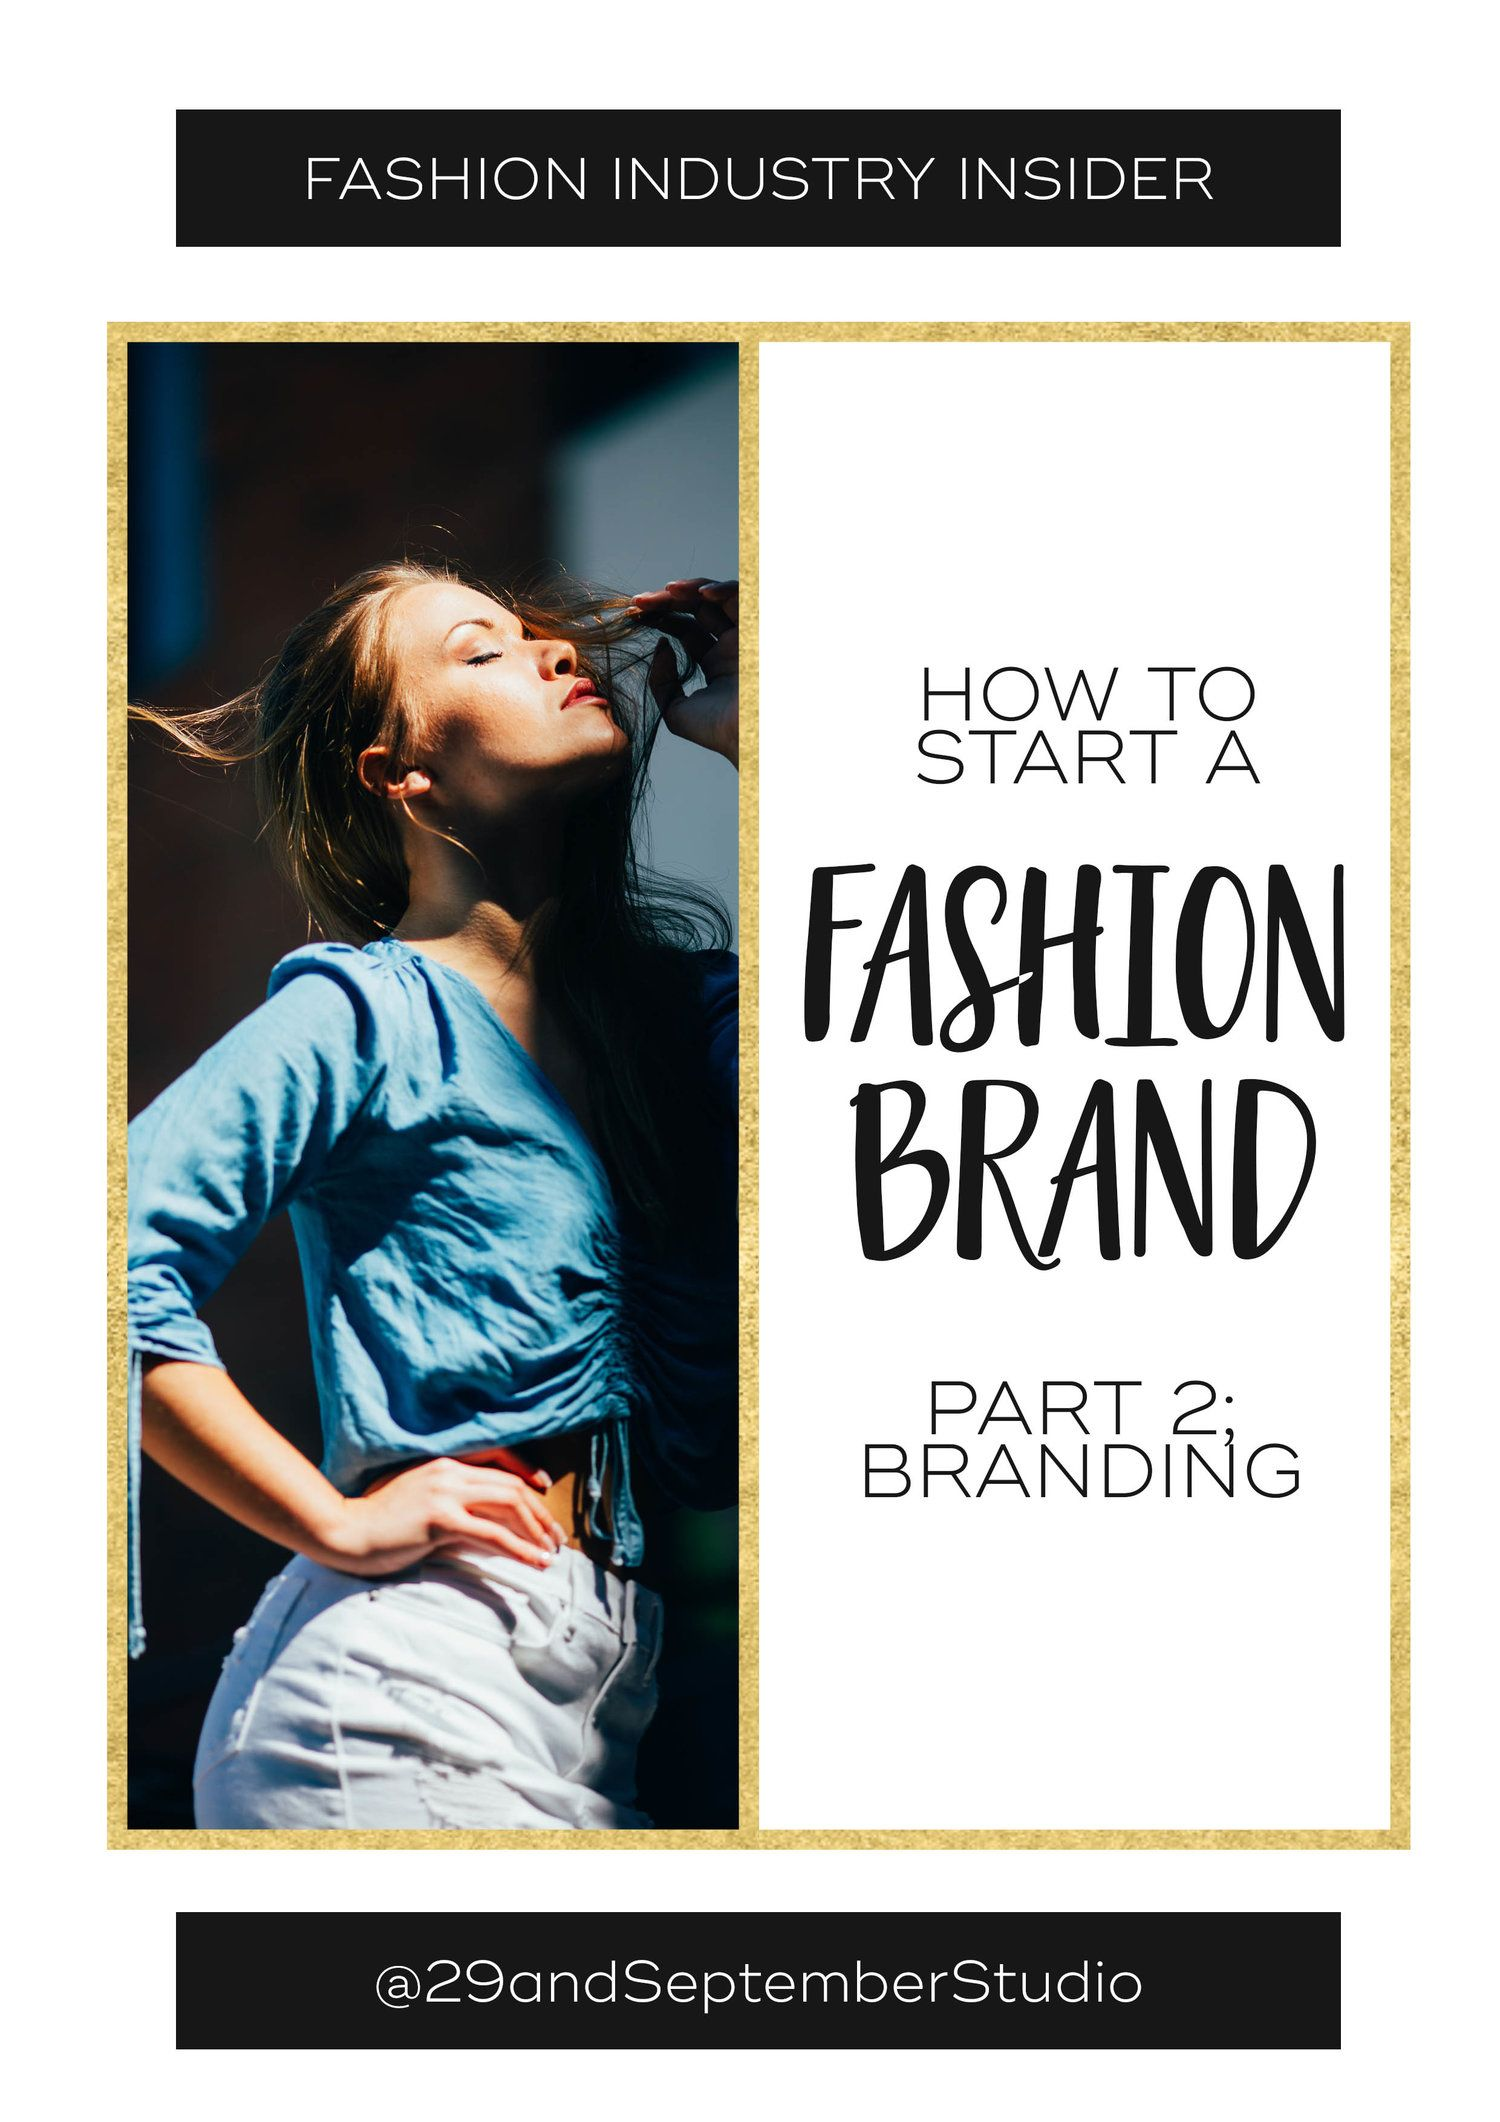 How to design a fashion magazine like Vogue - Flipsnack Blog 7